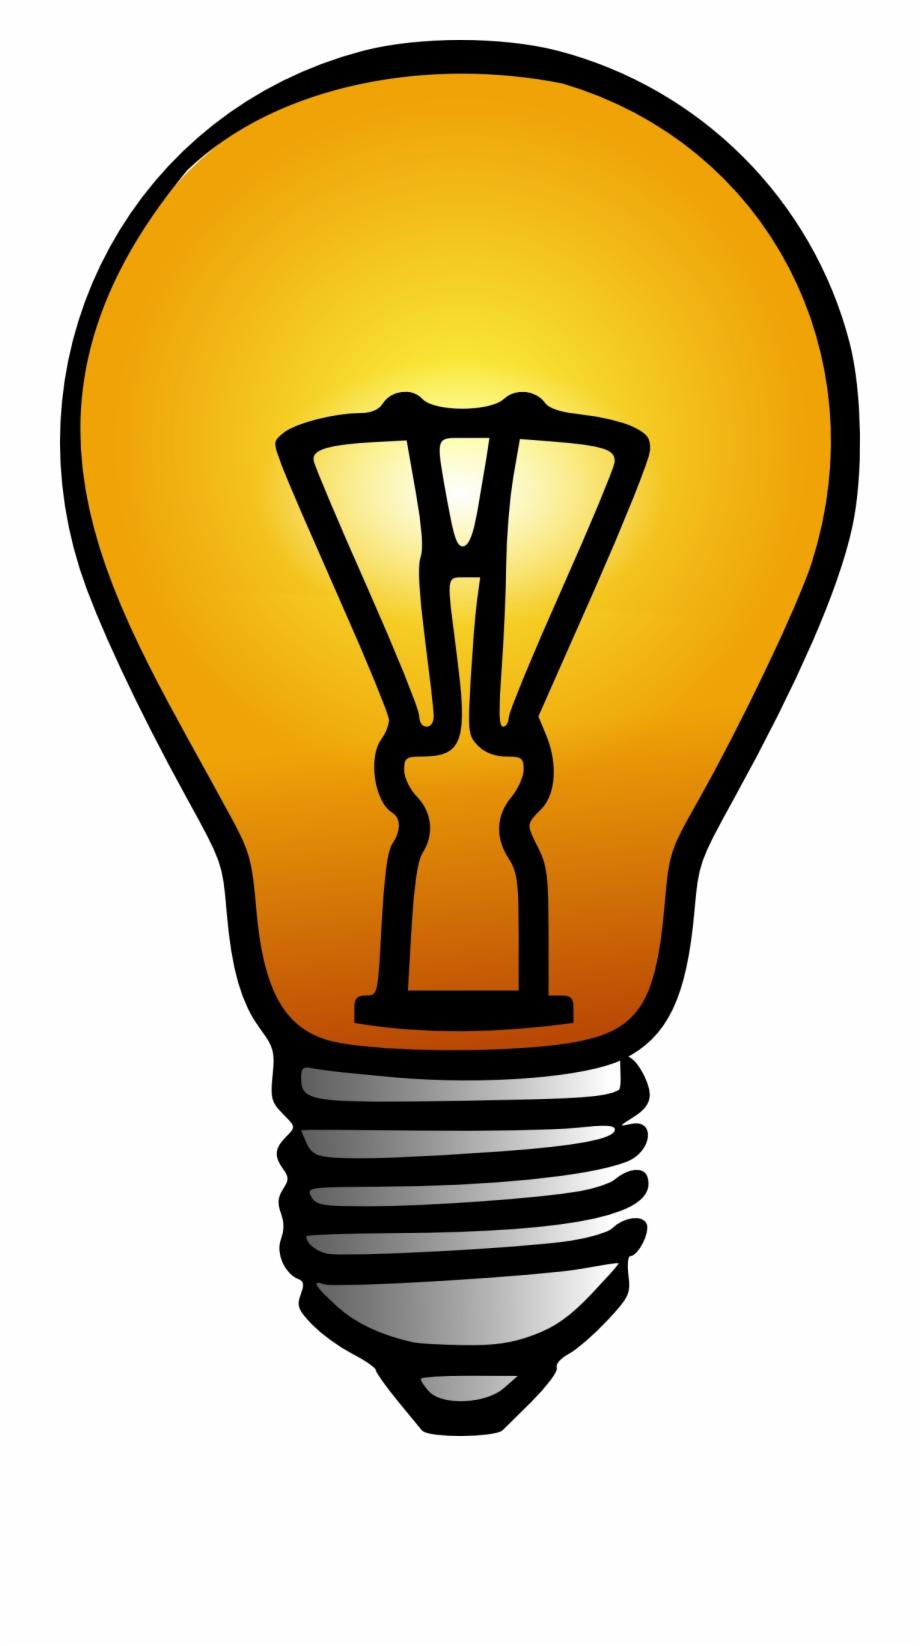 Lamp clipart electrical bulb. Electric light clip art